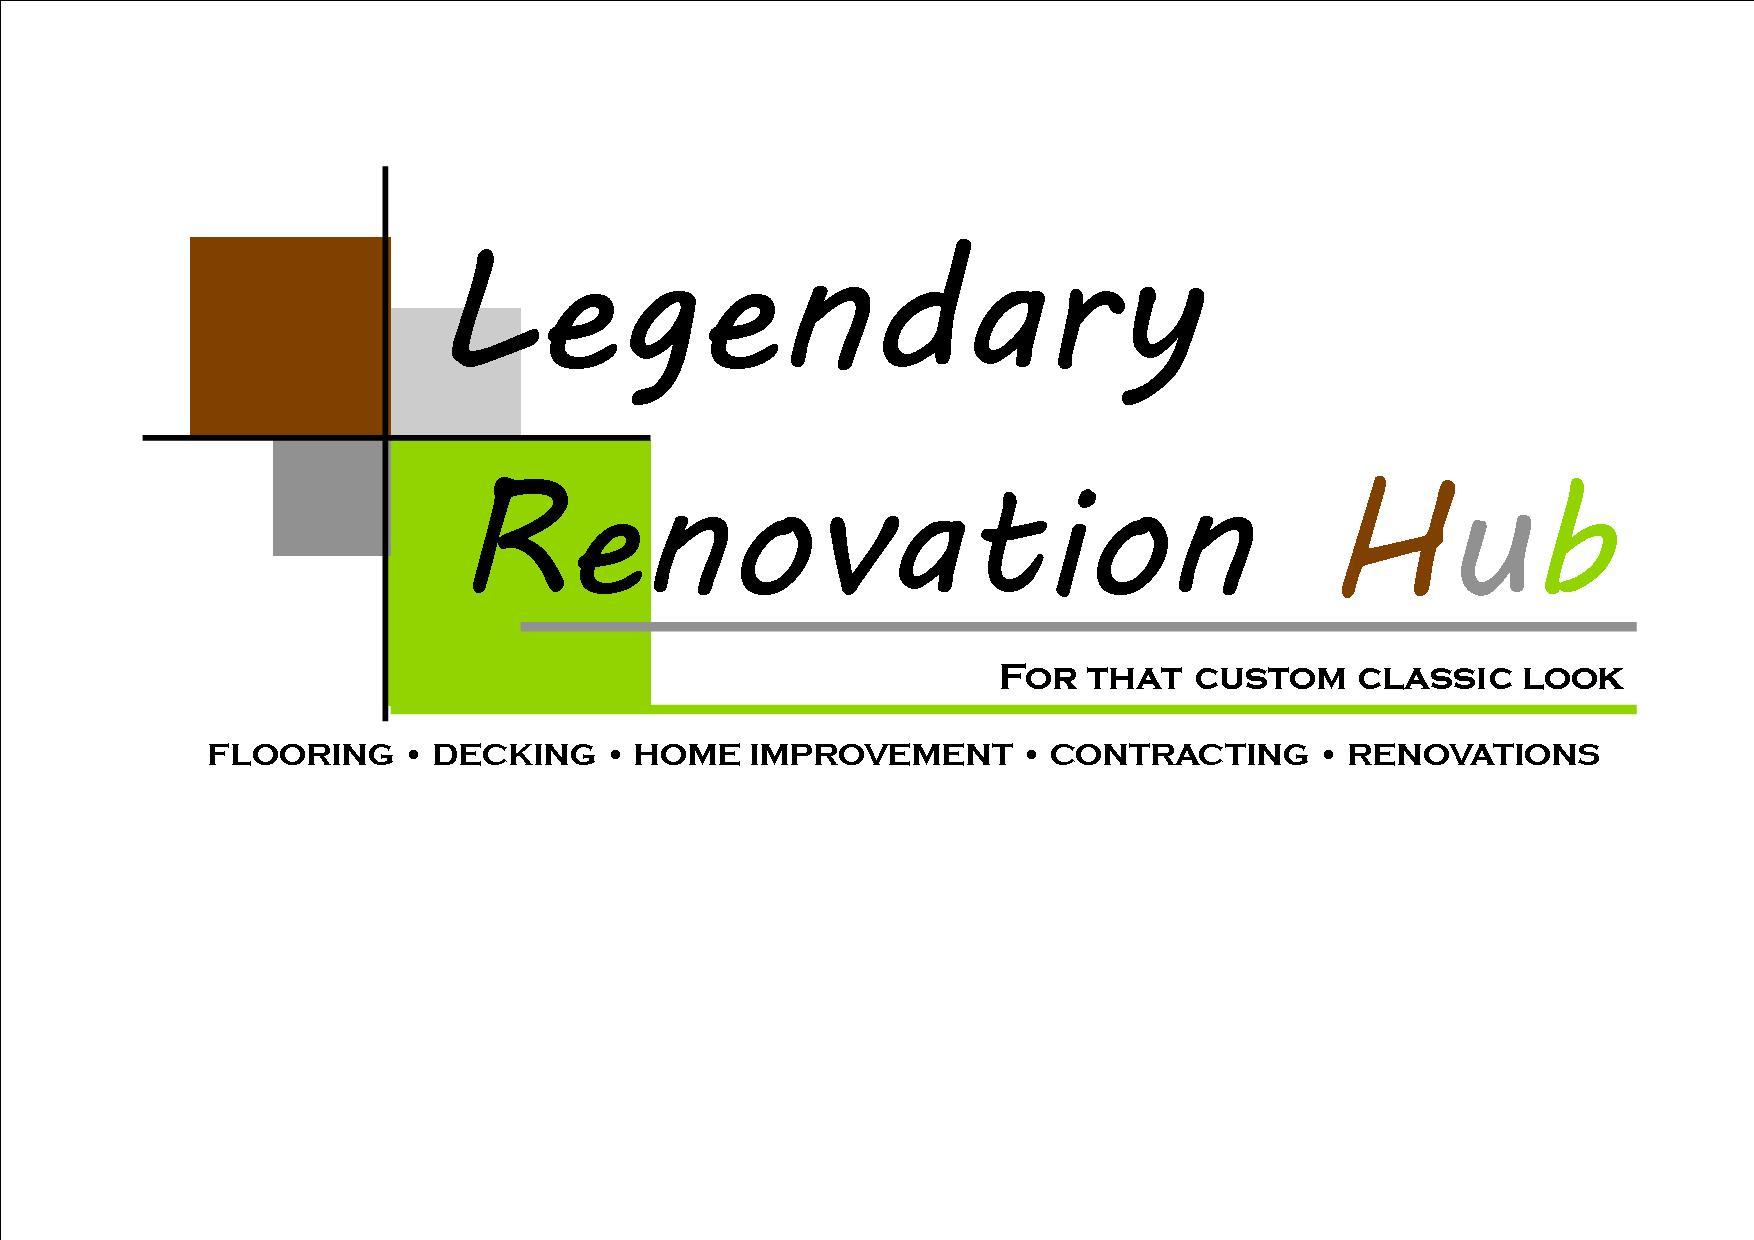 Legendary Renovation Hub Connect Me Now